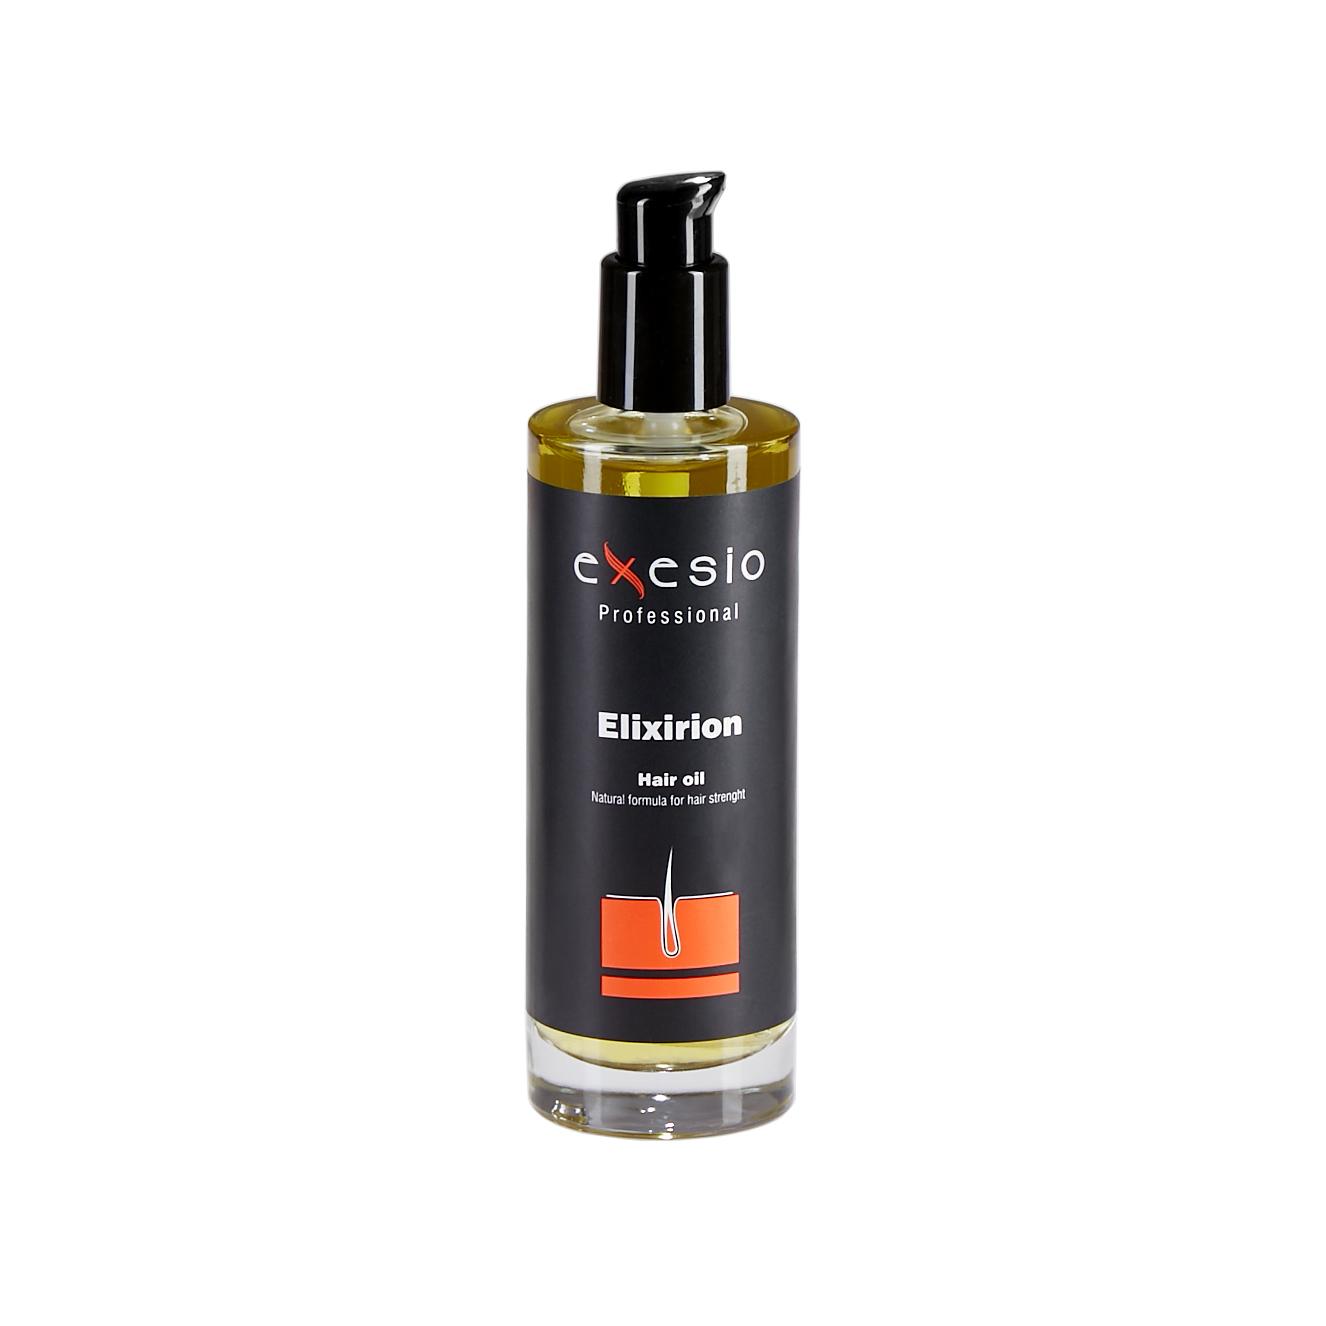 Elixirion Hair Oil